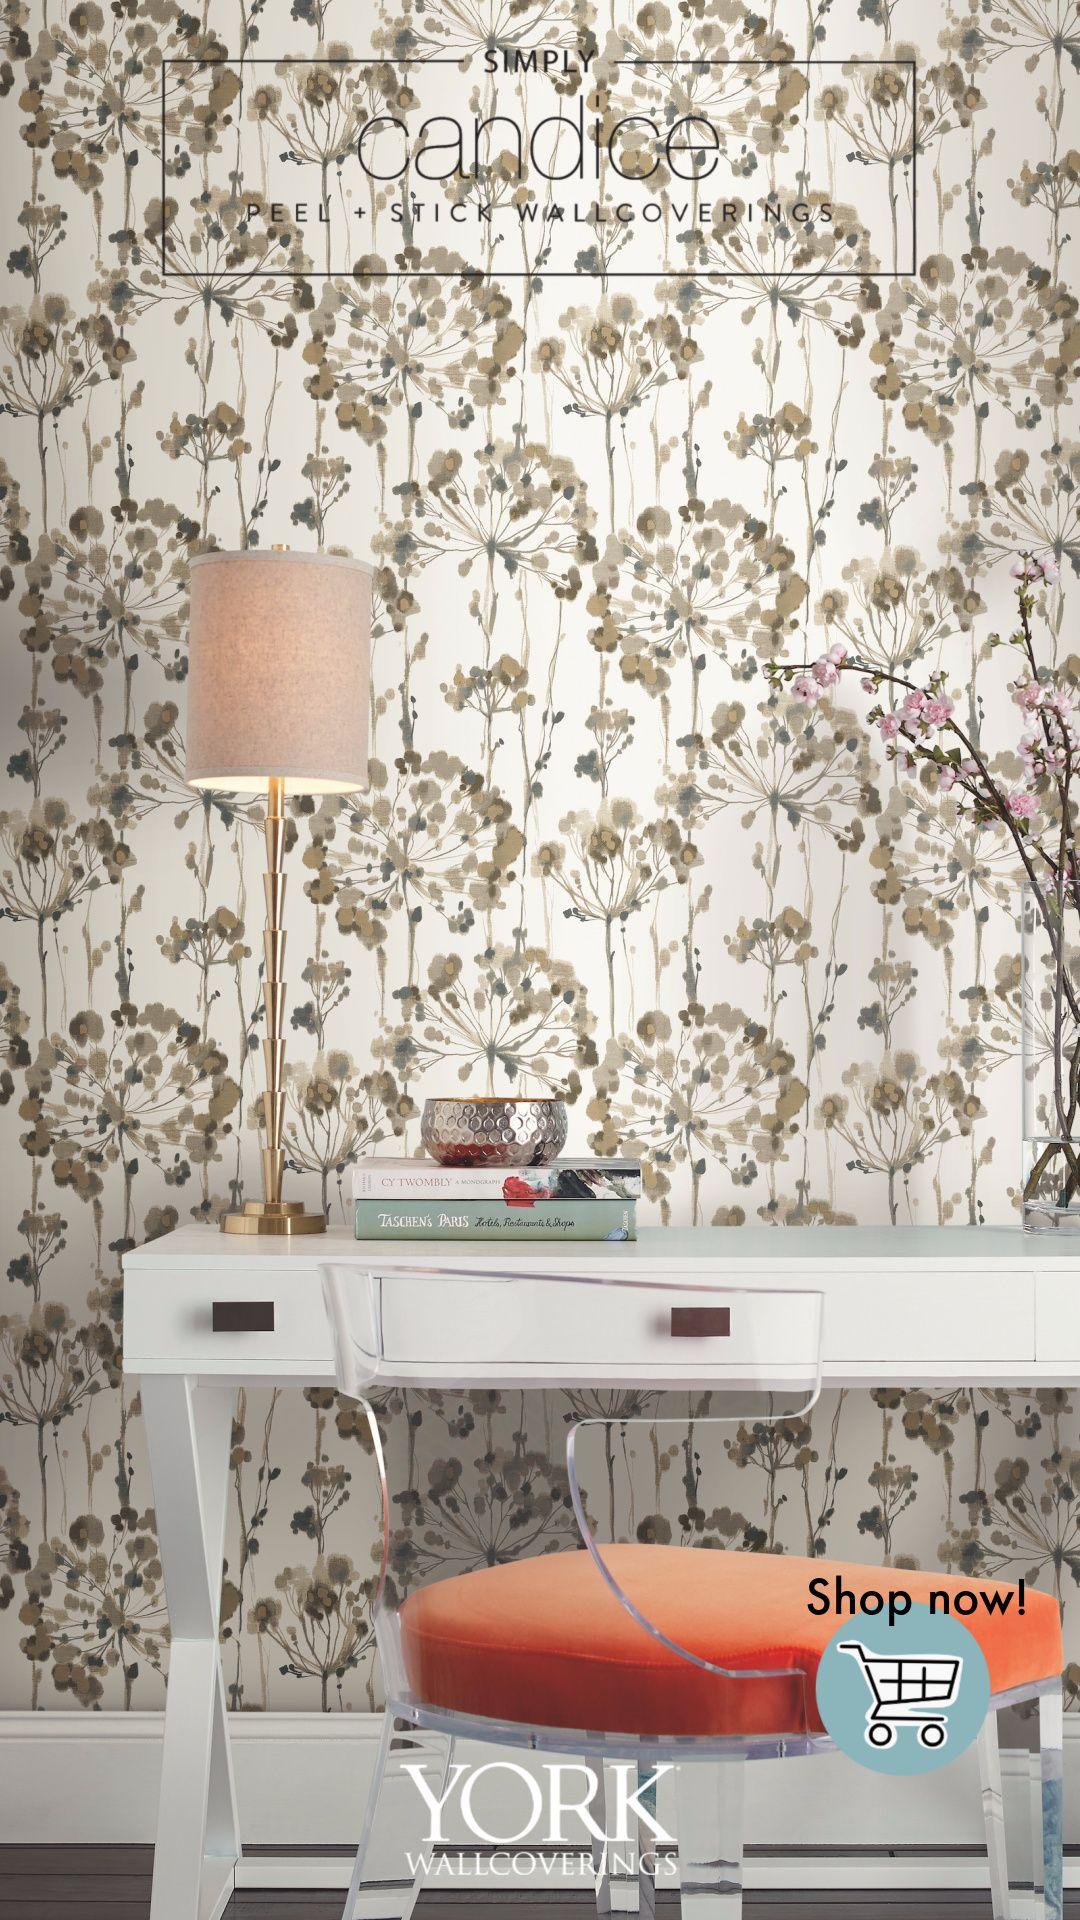 Flourish Premium Peel And Stick Wallpaper Peel And Stick Wallpaper Room Visualizer Removable Wallpaper